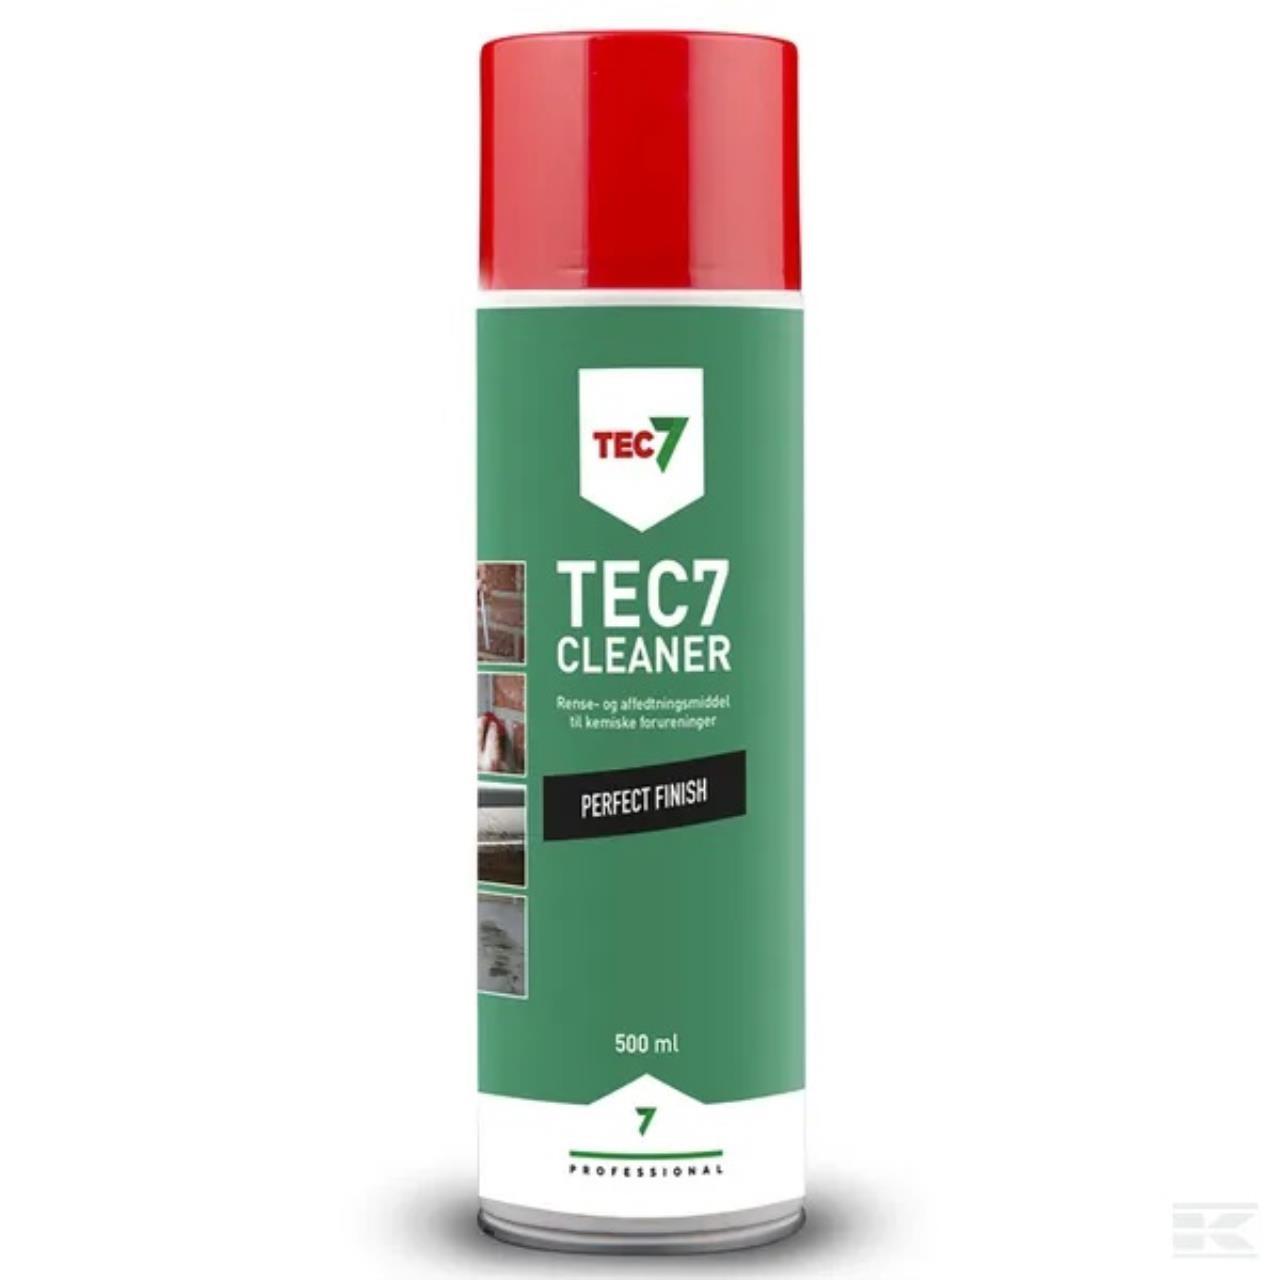 Tec7 Cleaner spray 500 ml